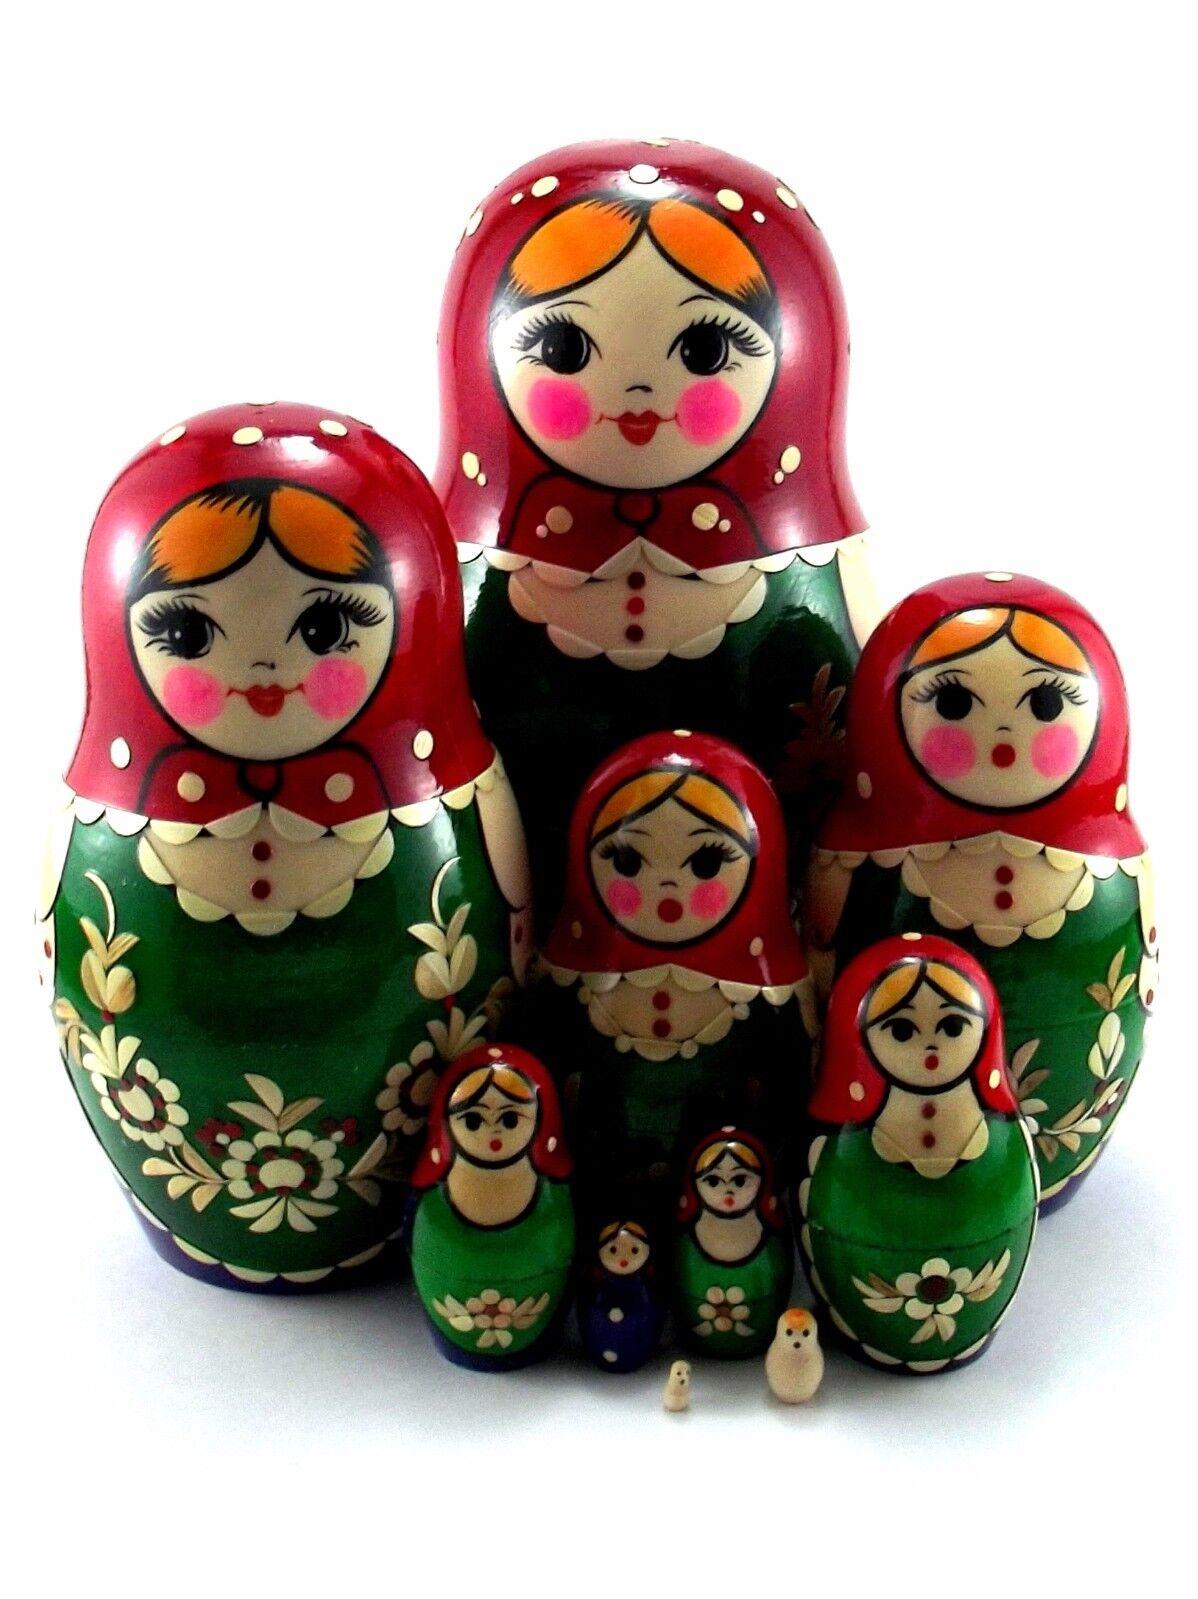 MATRIOSKA  BAMBOLA Baautobuschka cioé russa bambole in legno originale 10 pezzi 17cm  a buon mercato